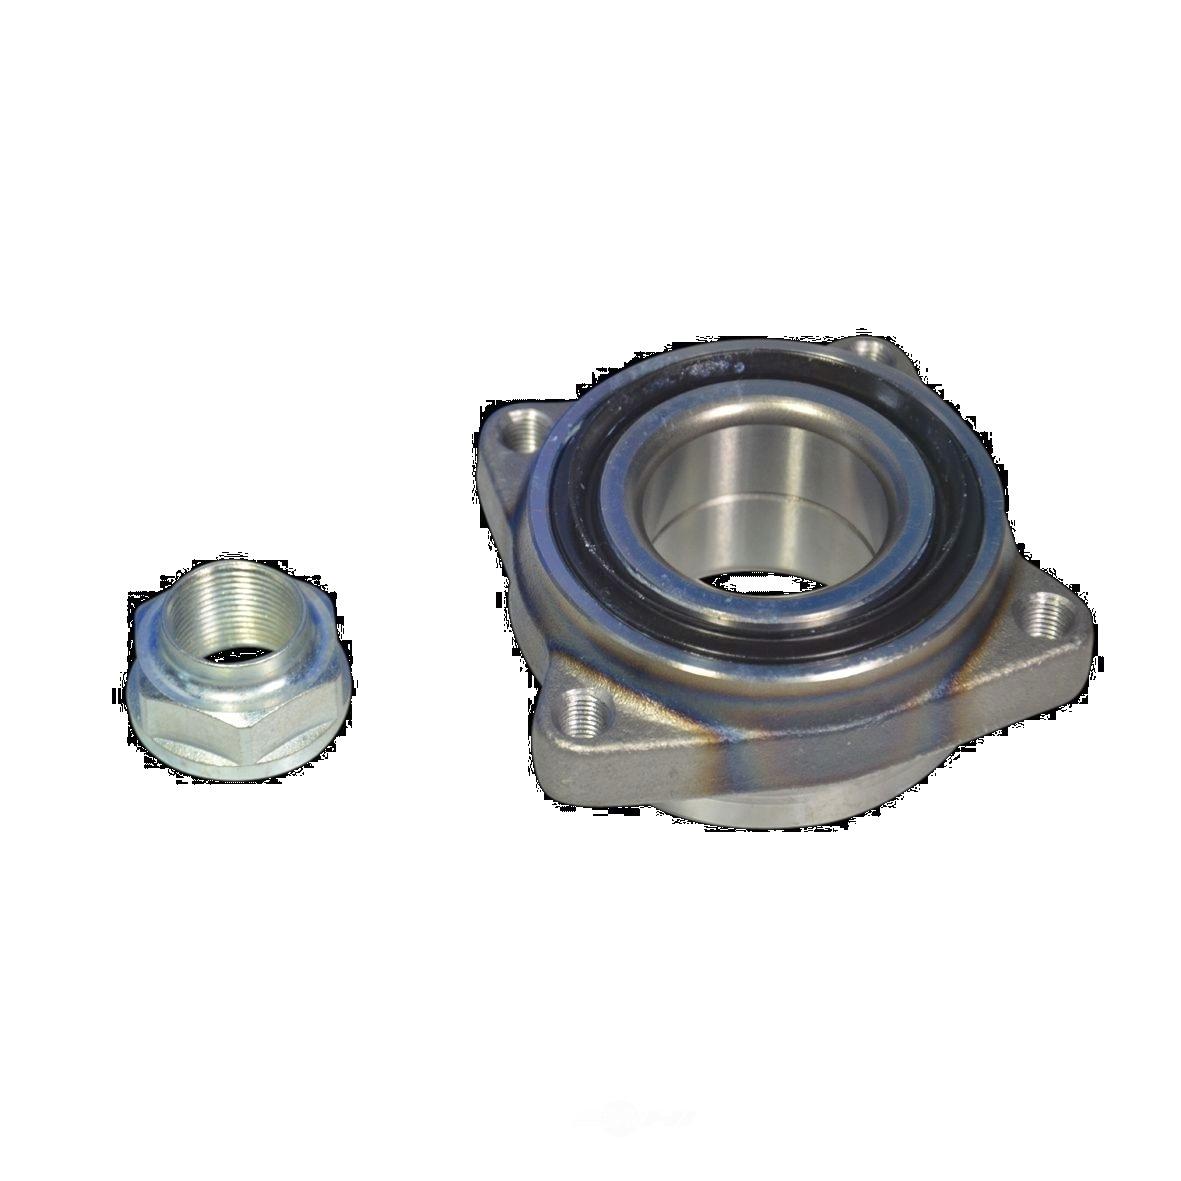 GSP NORTH AMERICA INC. - Wheel Bearing - AD8 214098